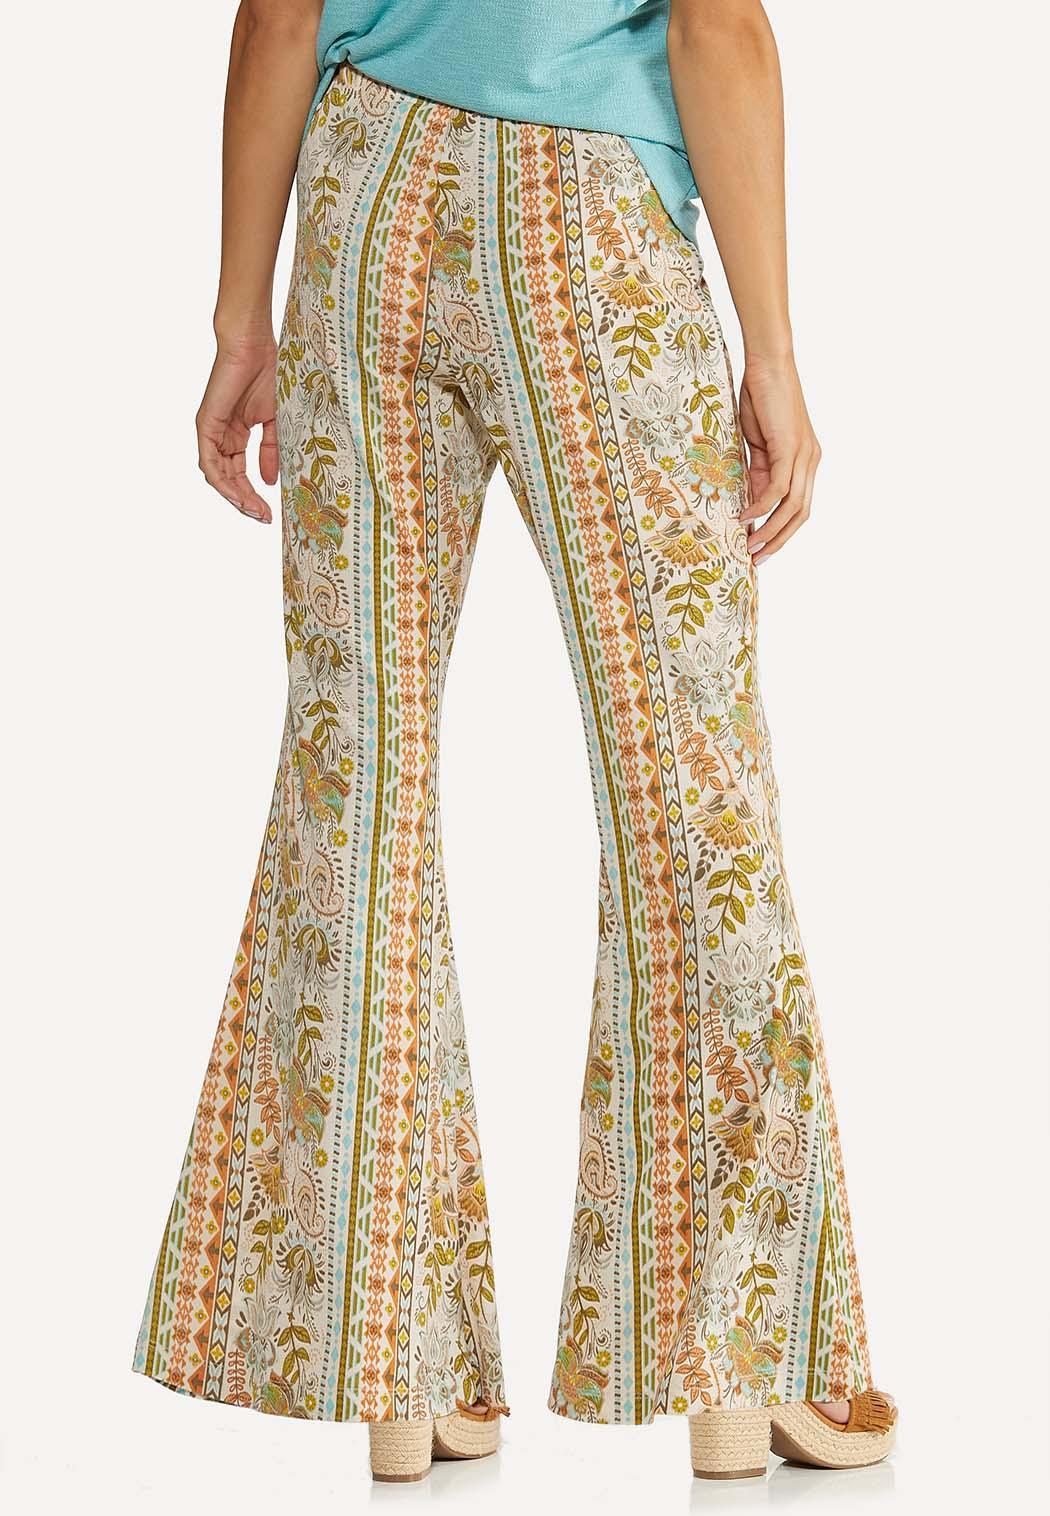 Petite Retro Floral Flare Pants (Item #44618250)